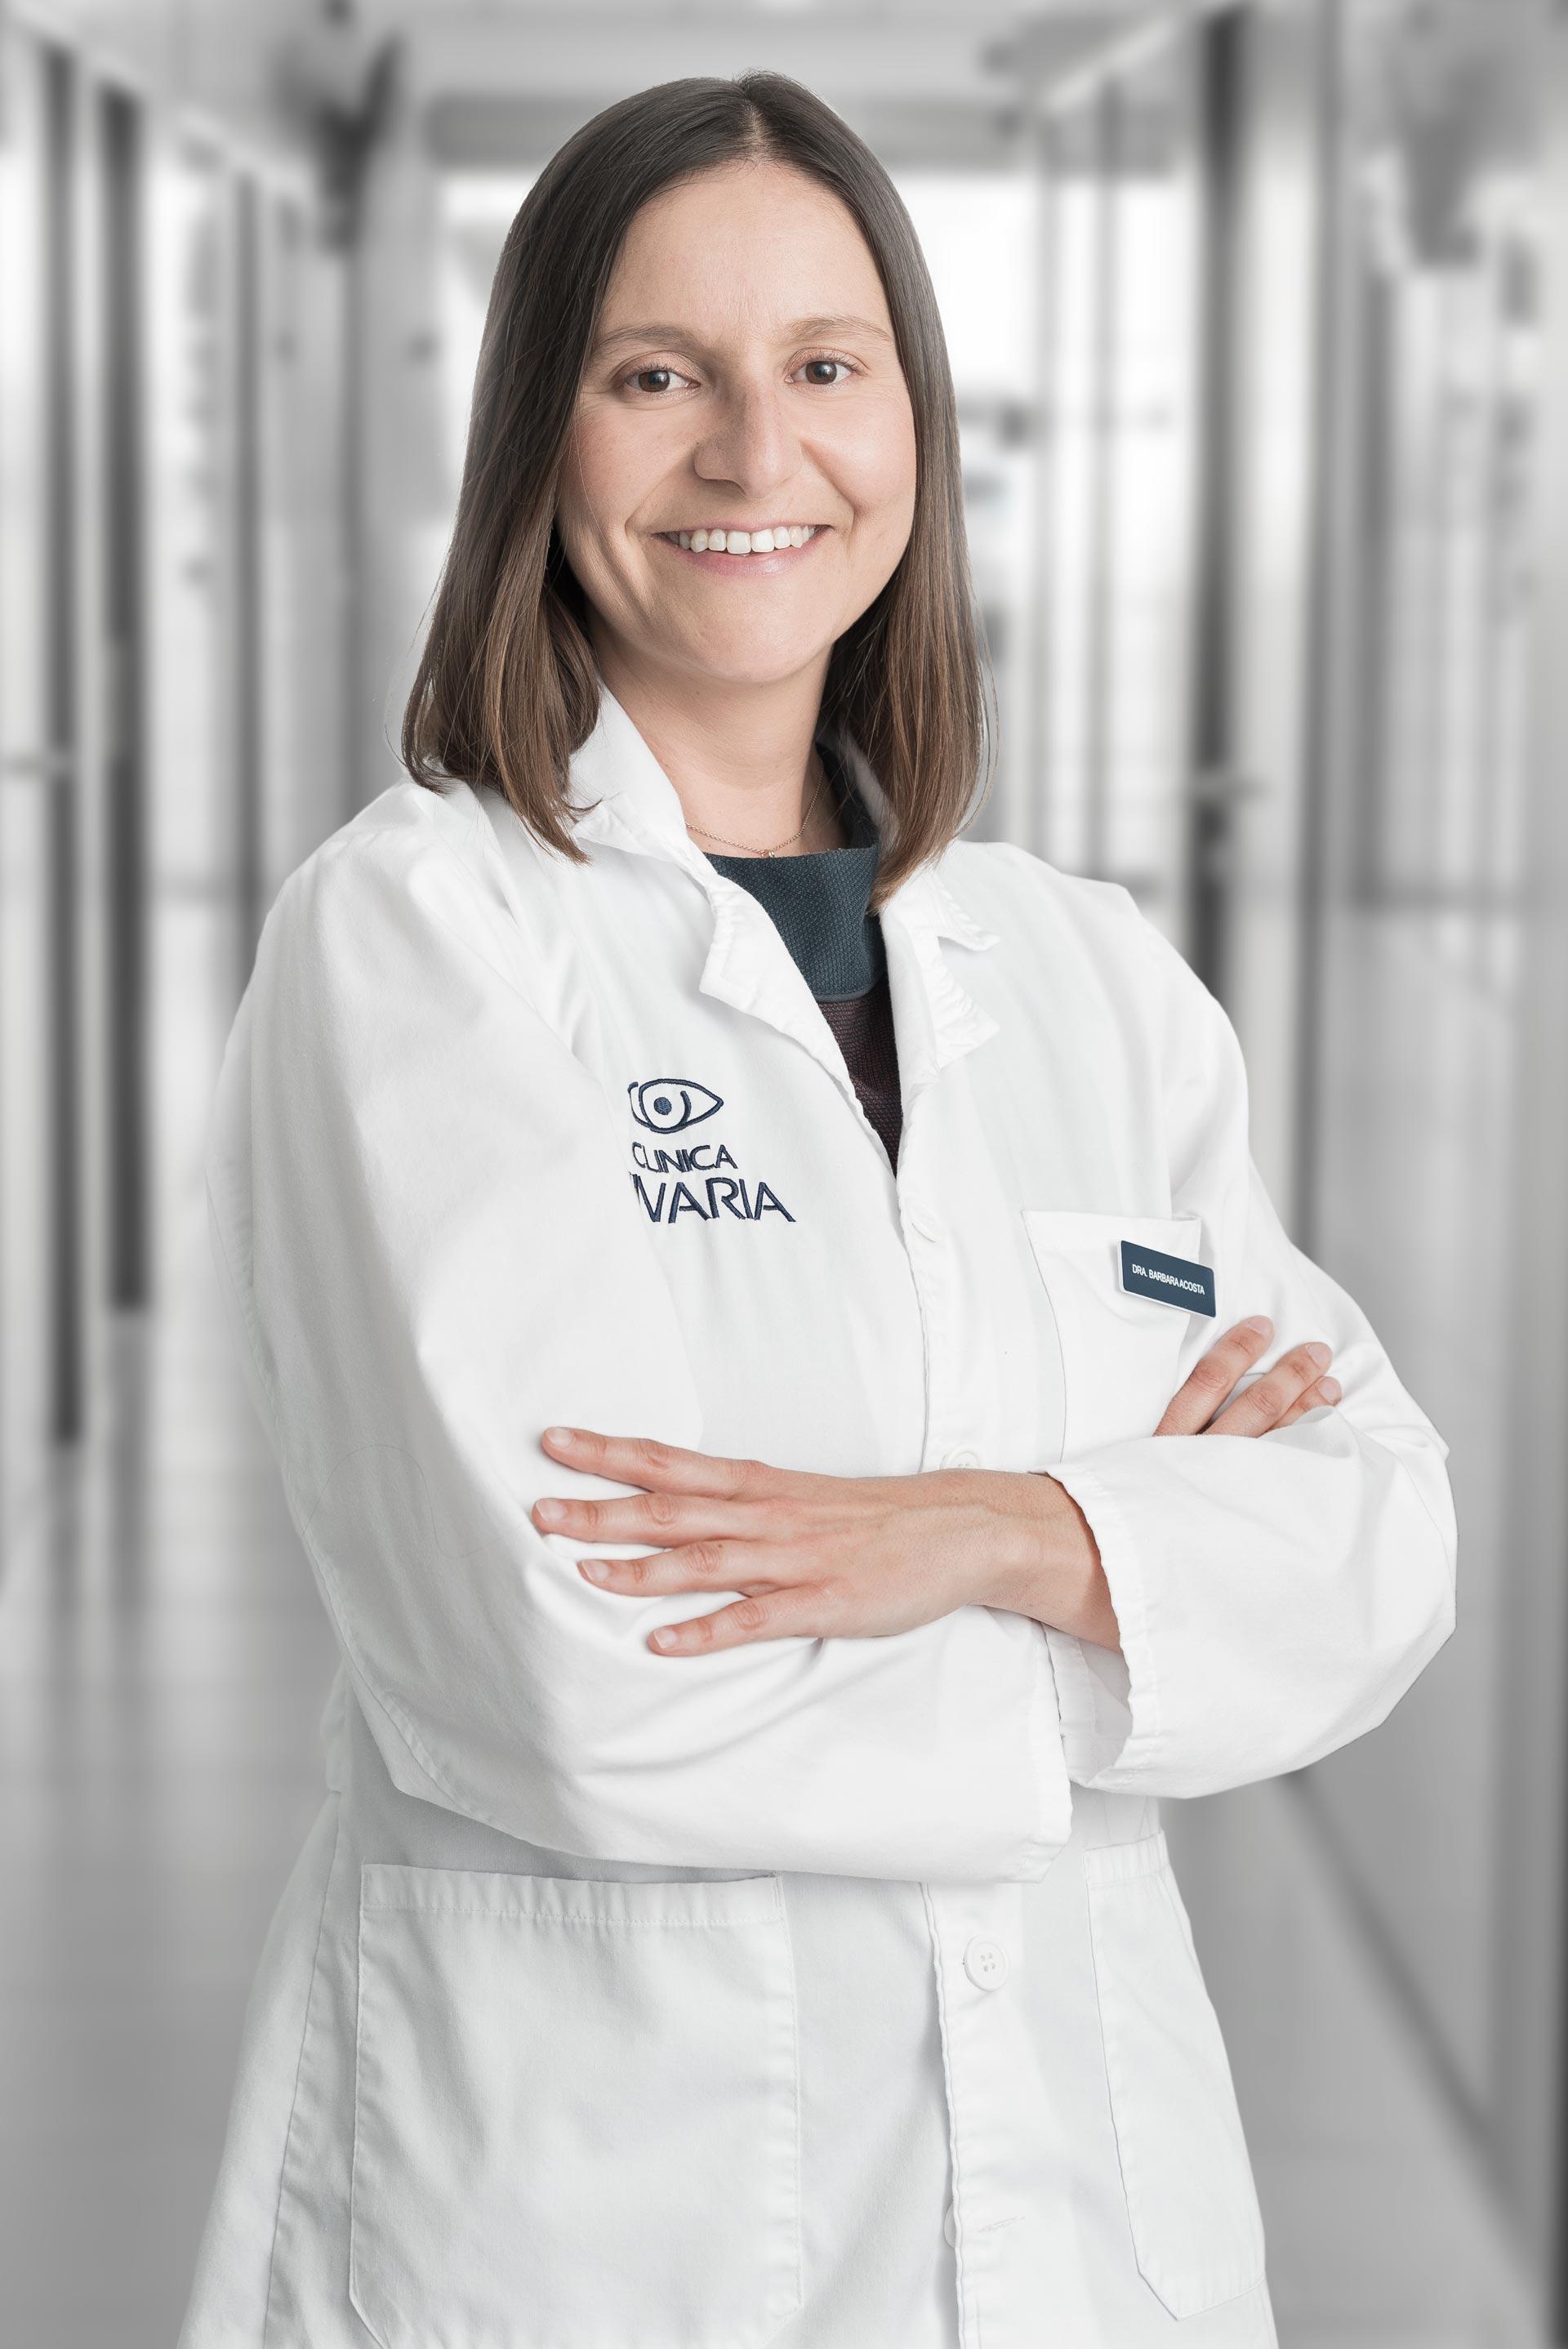 Dra. Bárbara Acosta